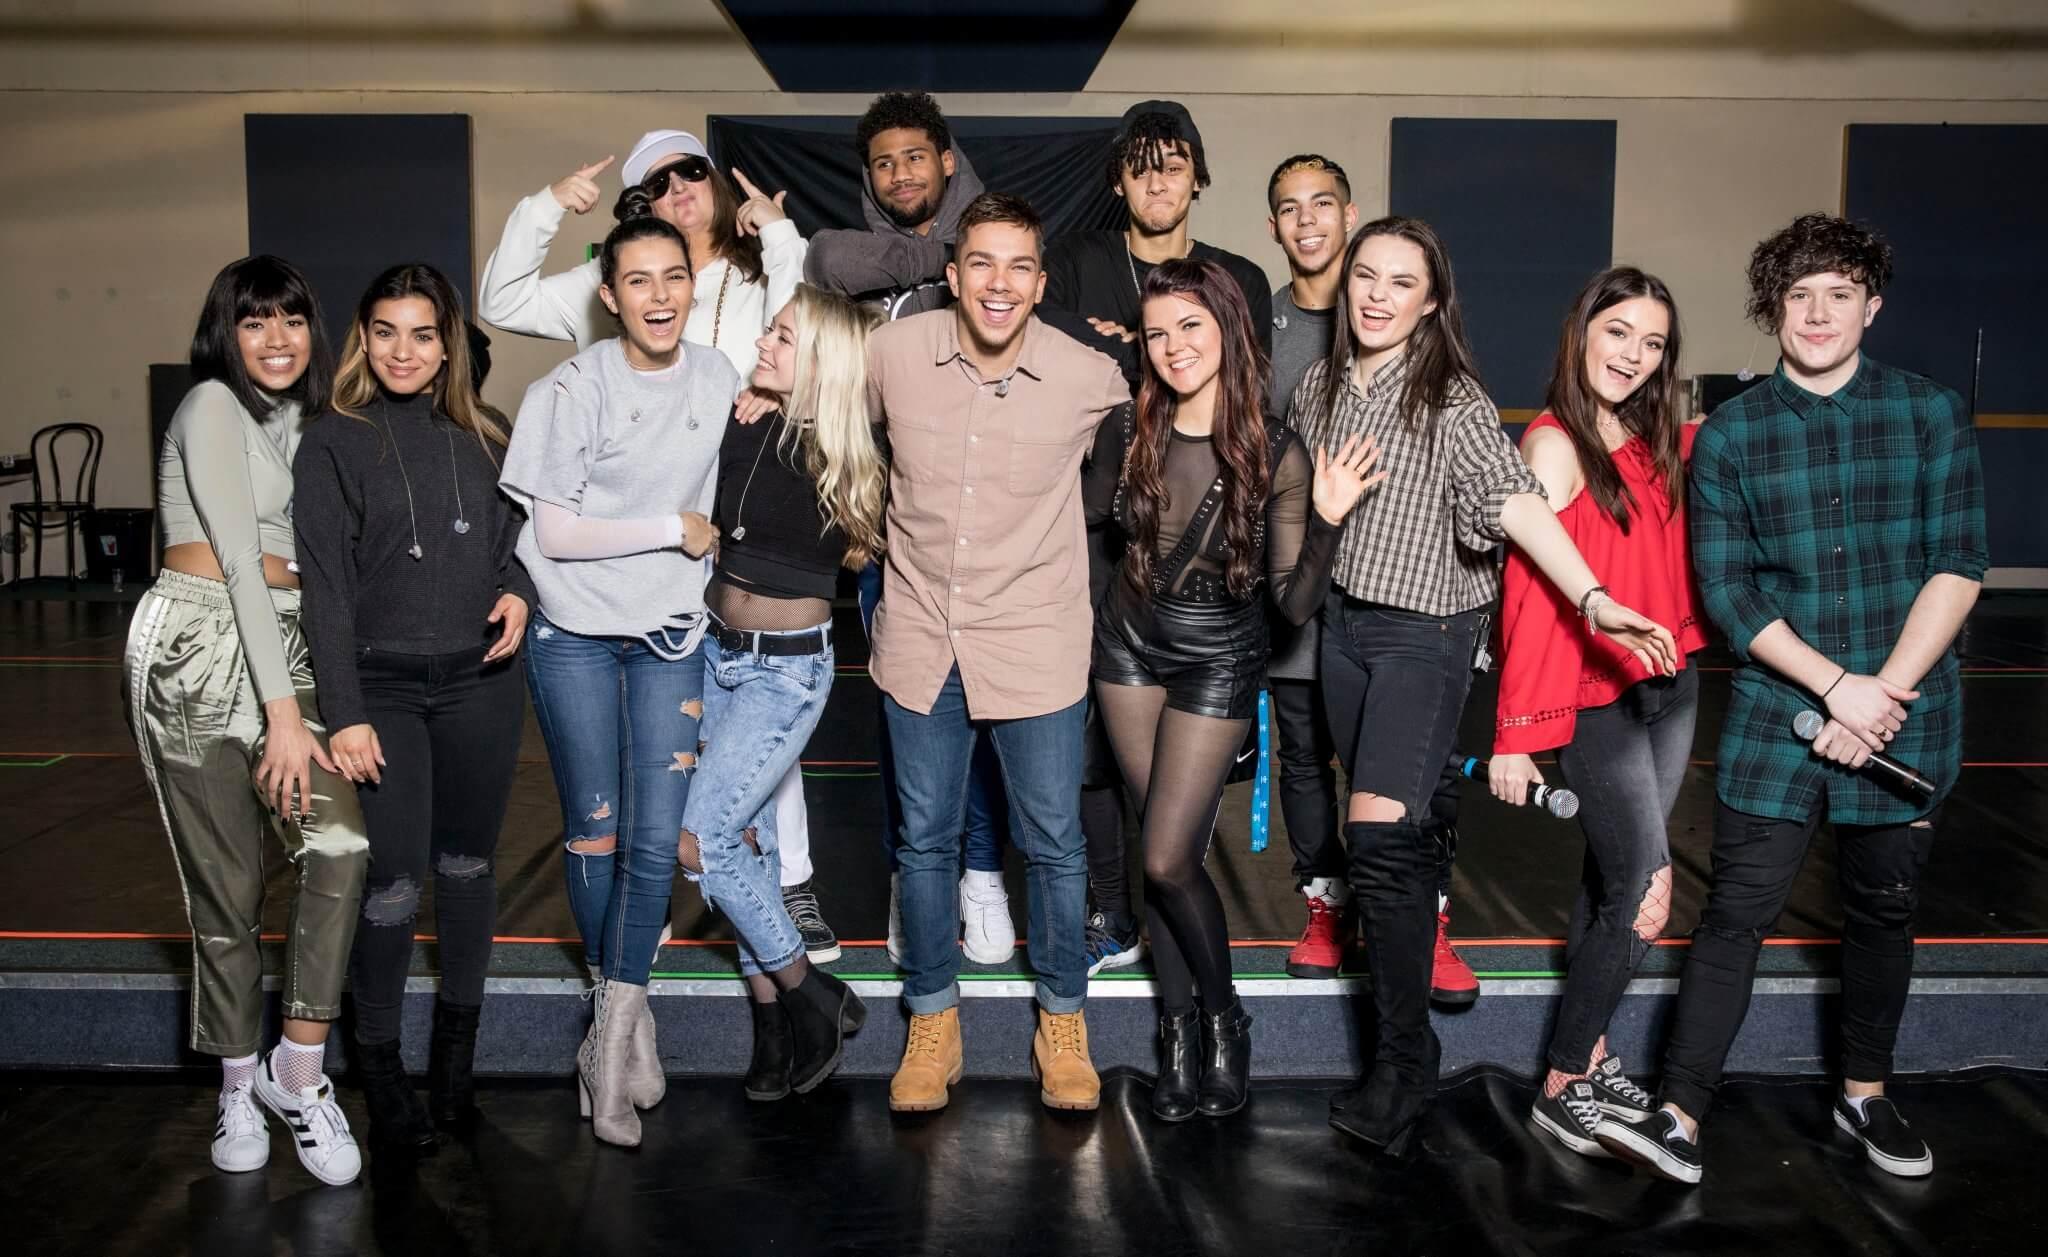 The X Factor Live Tour, x factor sheffield, x factor sheffield arena,